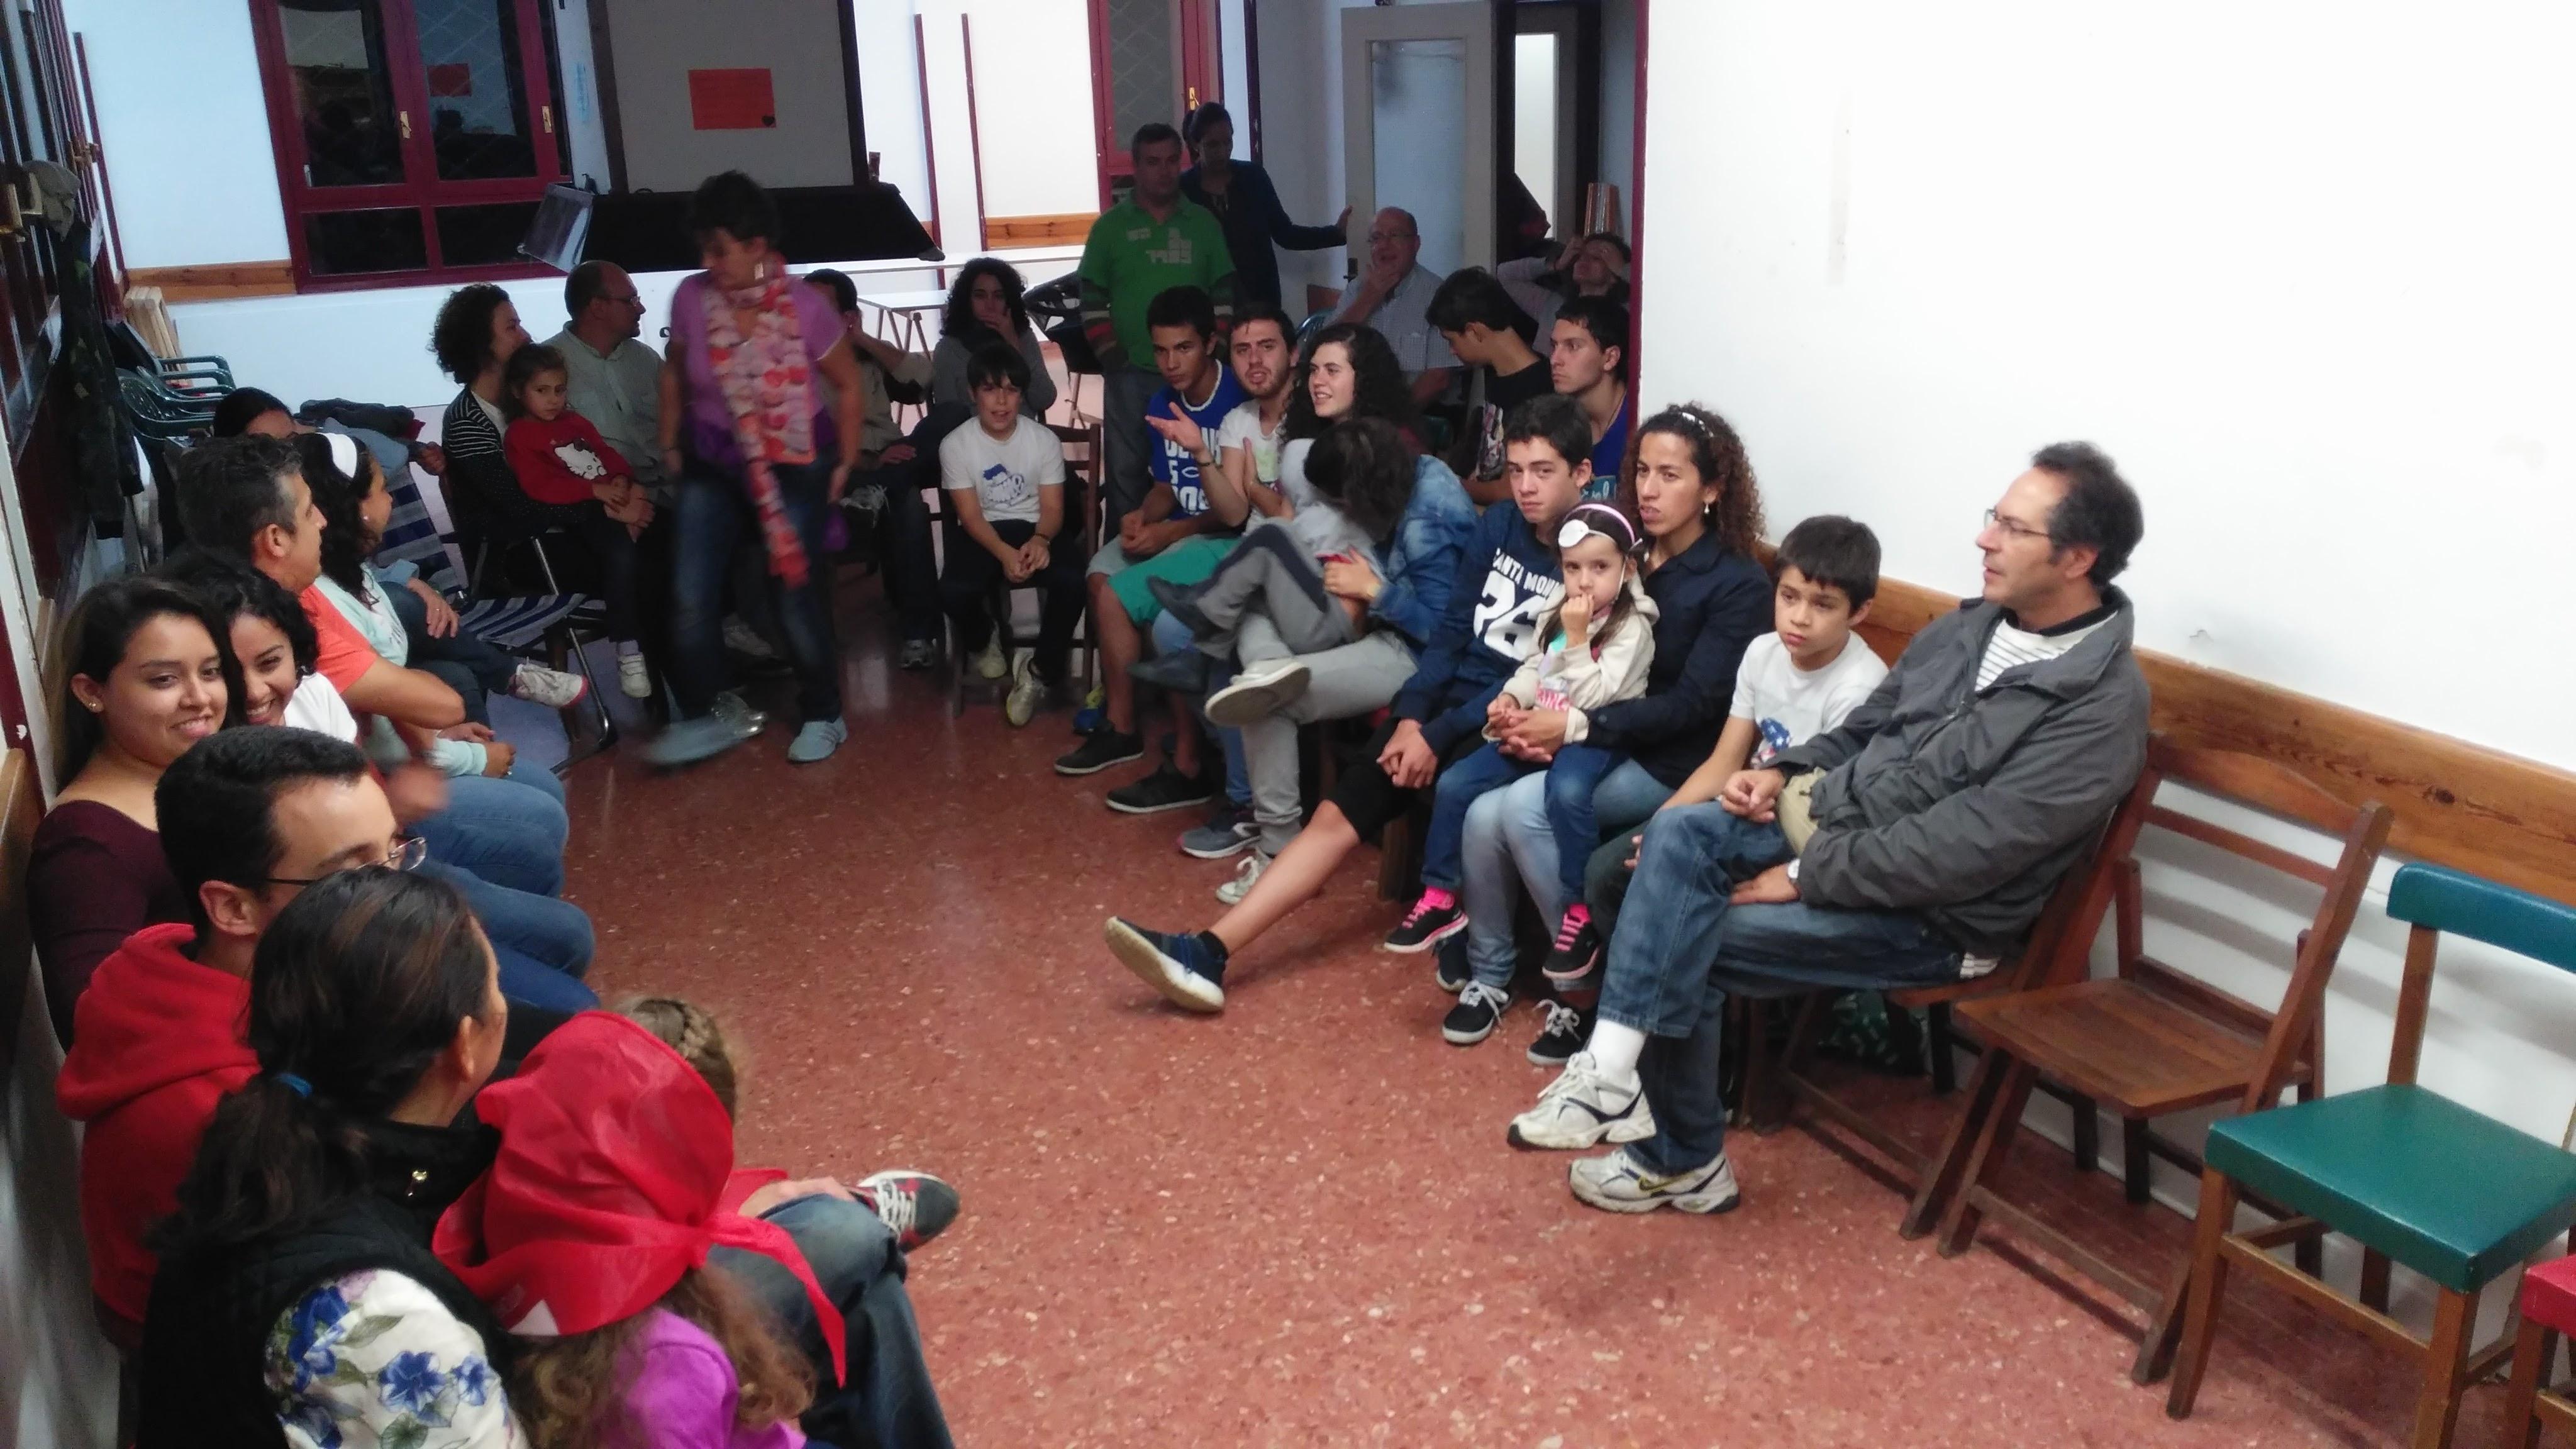 Picasa - 2015.09.12-13 - Convivencia Sector Familias(21).jpg